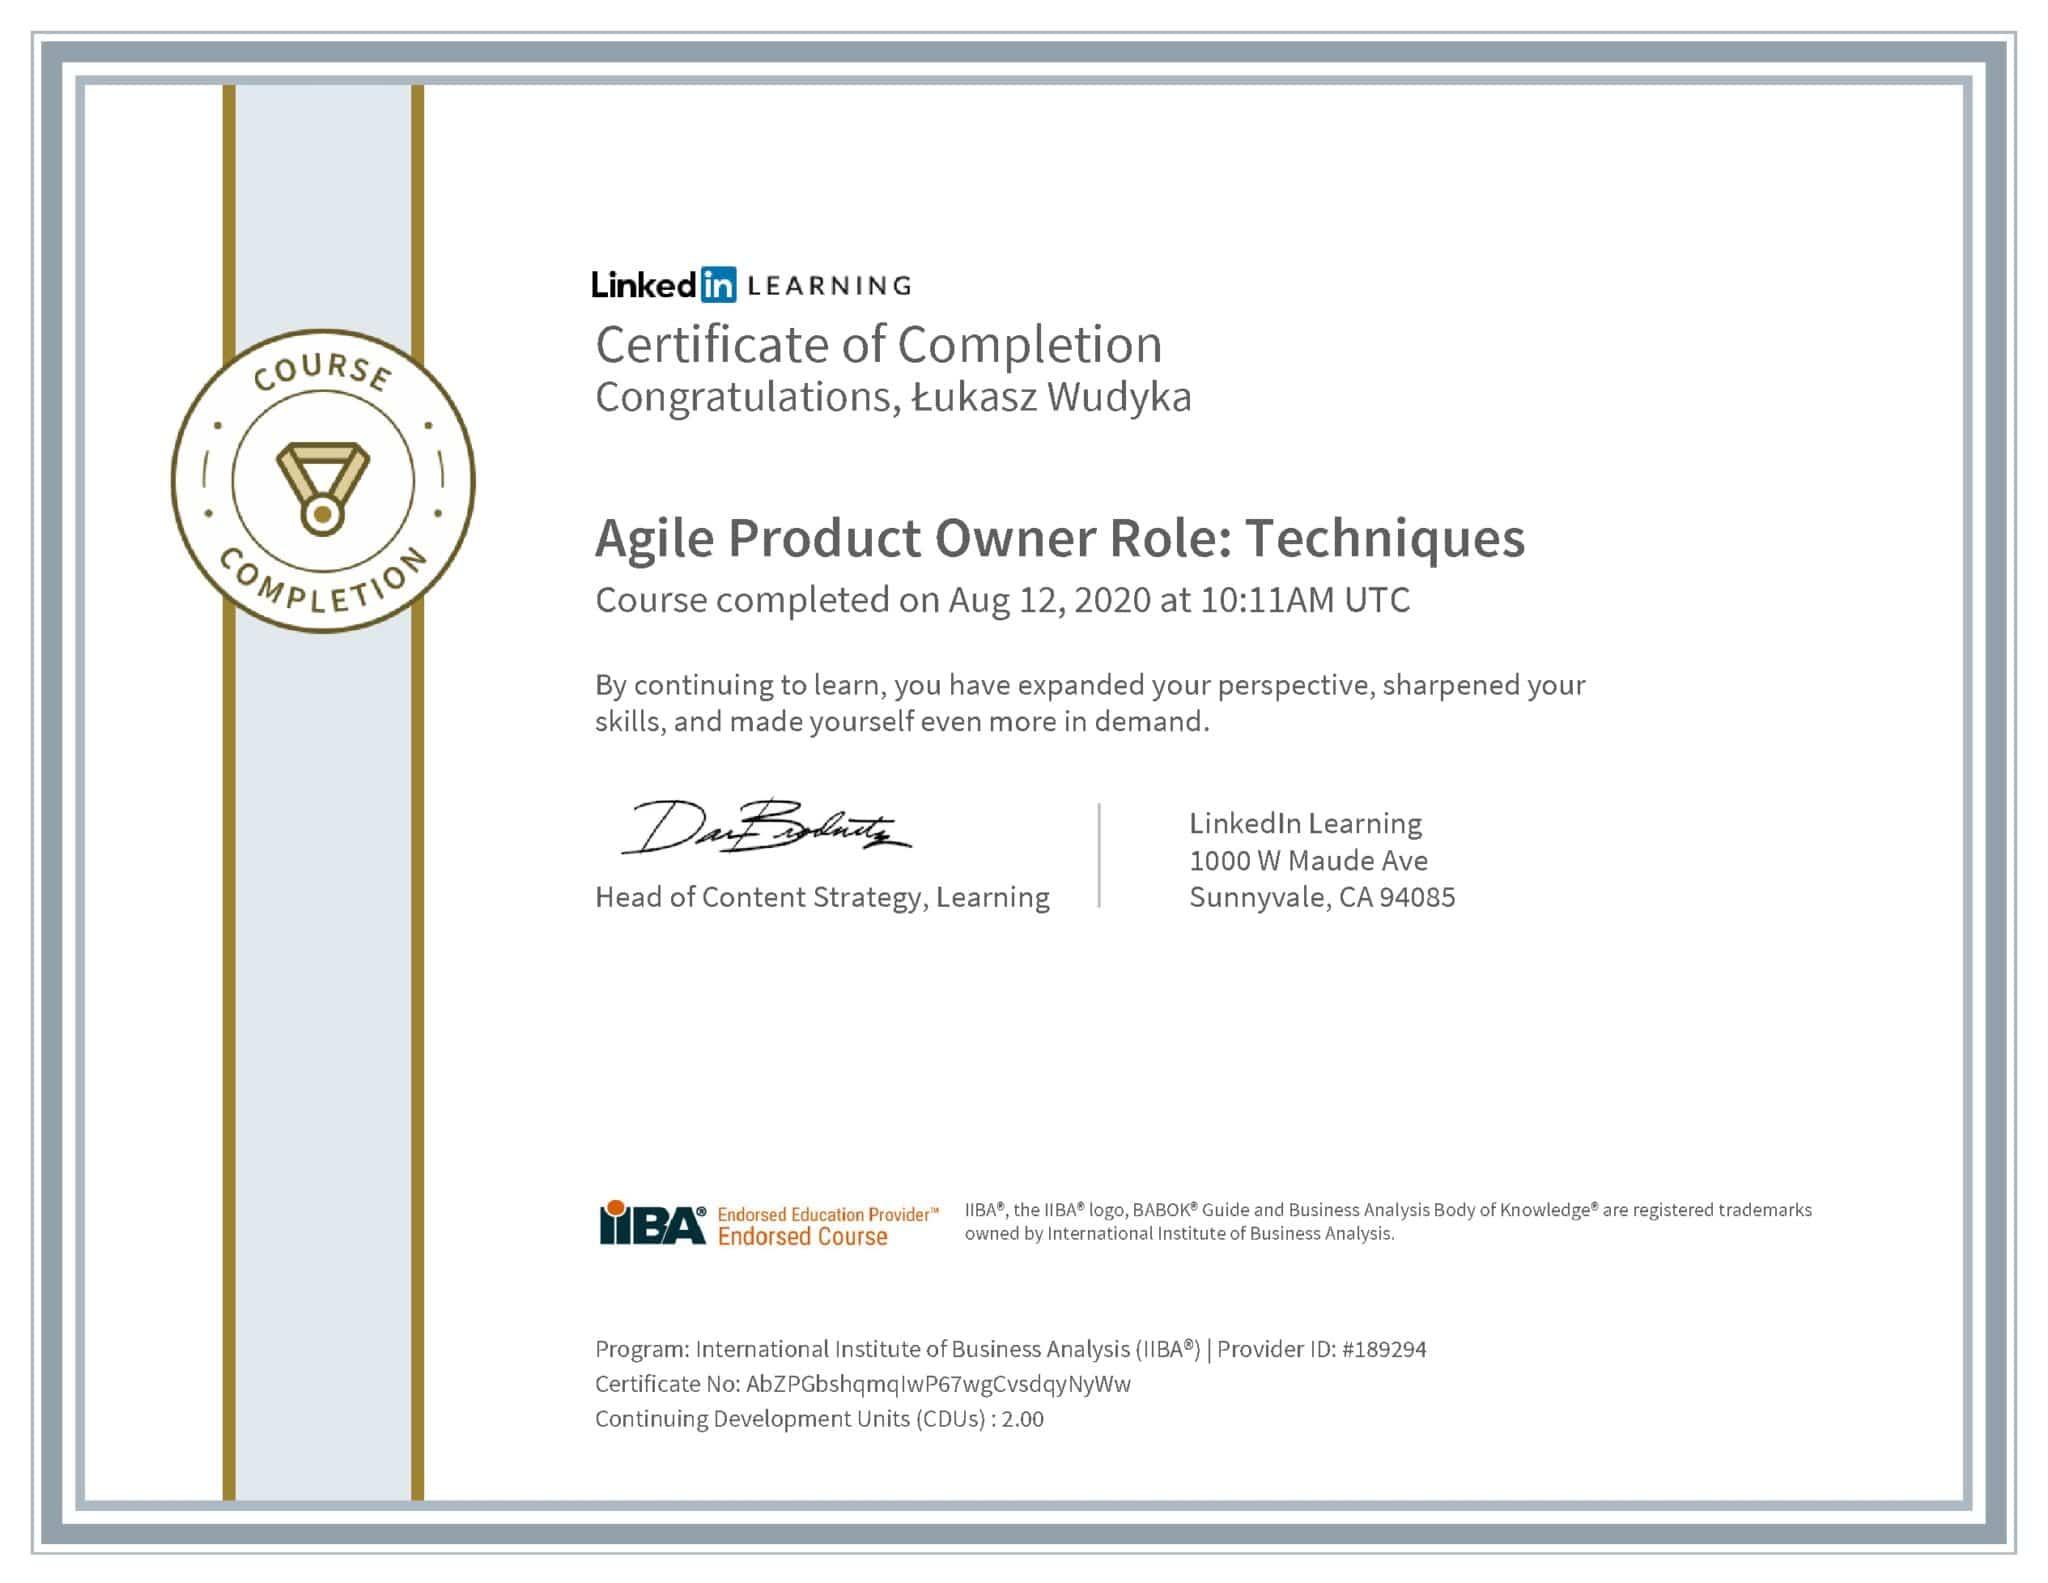 Łukasz Wudyka certyfikat LinkedIn Agile Product Owner Role: Techniques IIBA